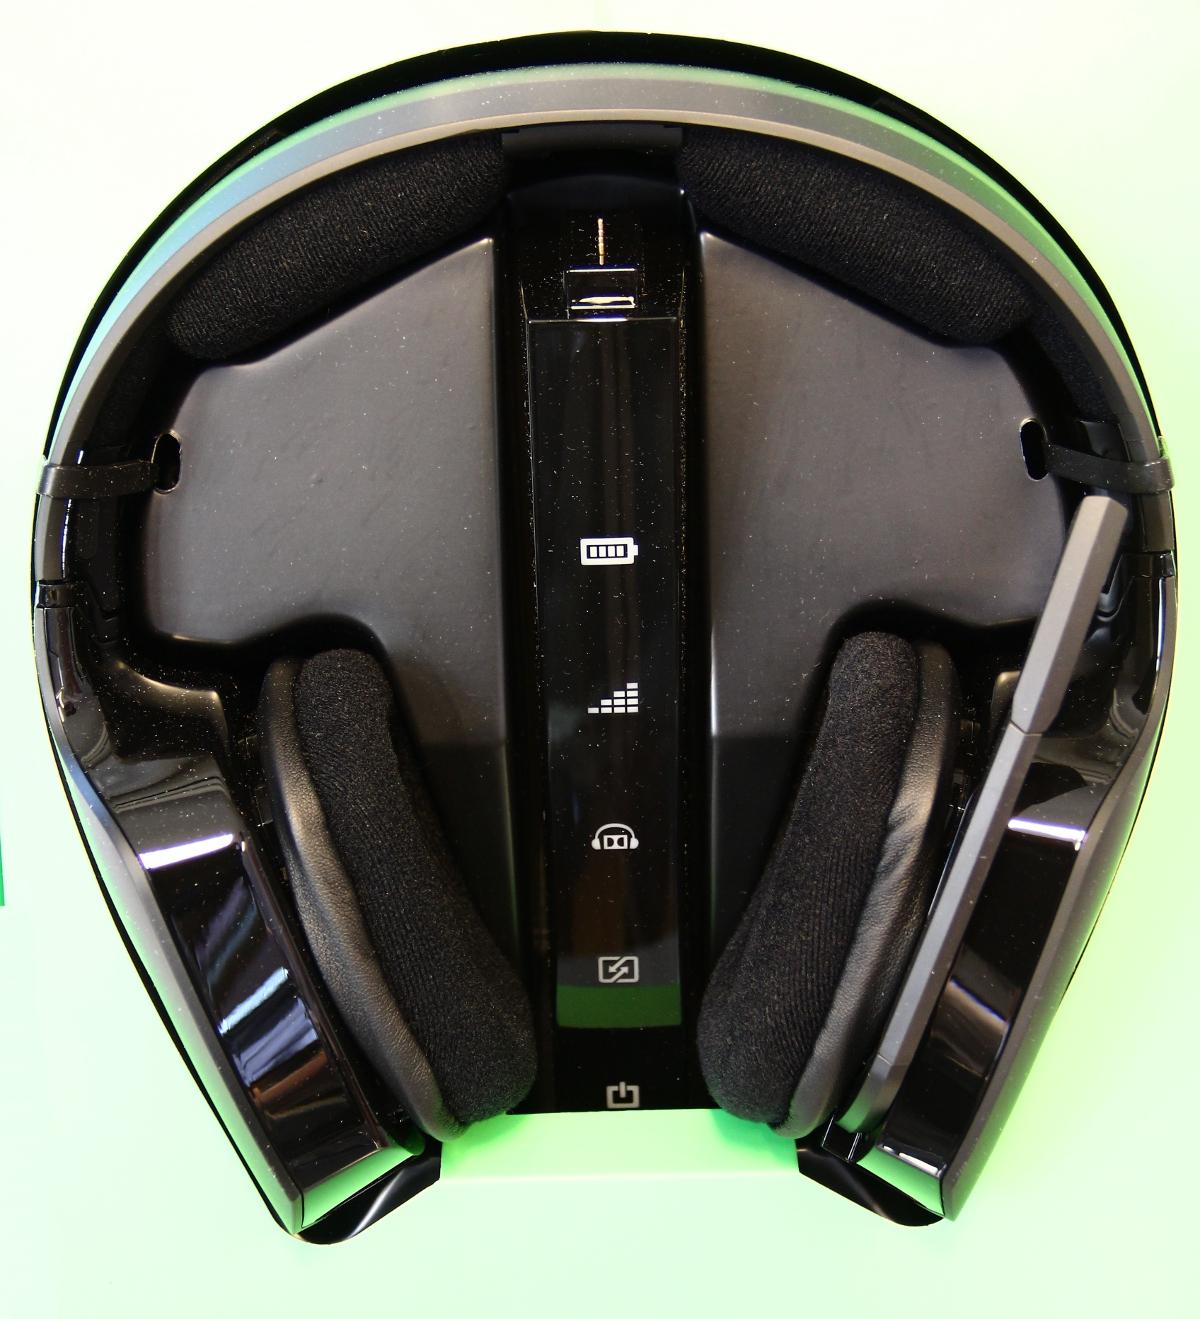 Full shot of the headphones